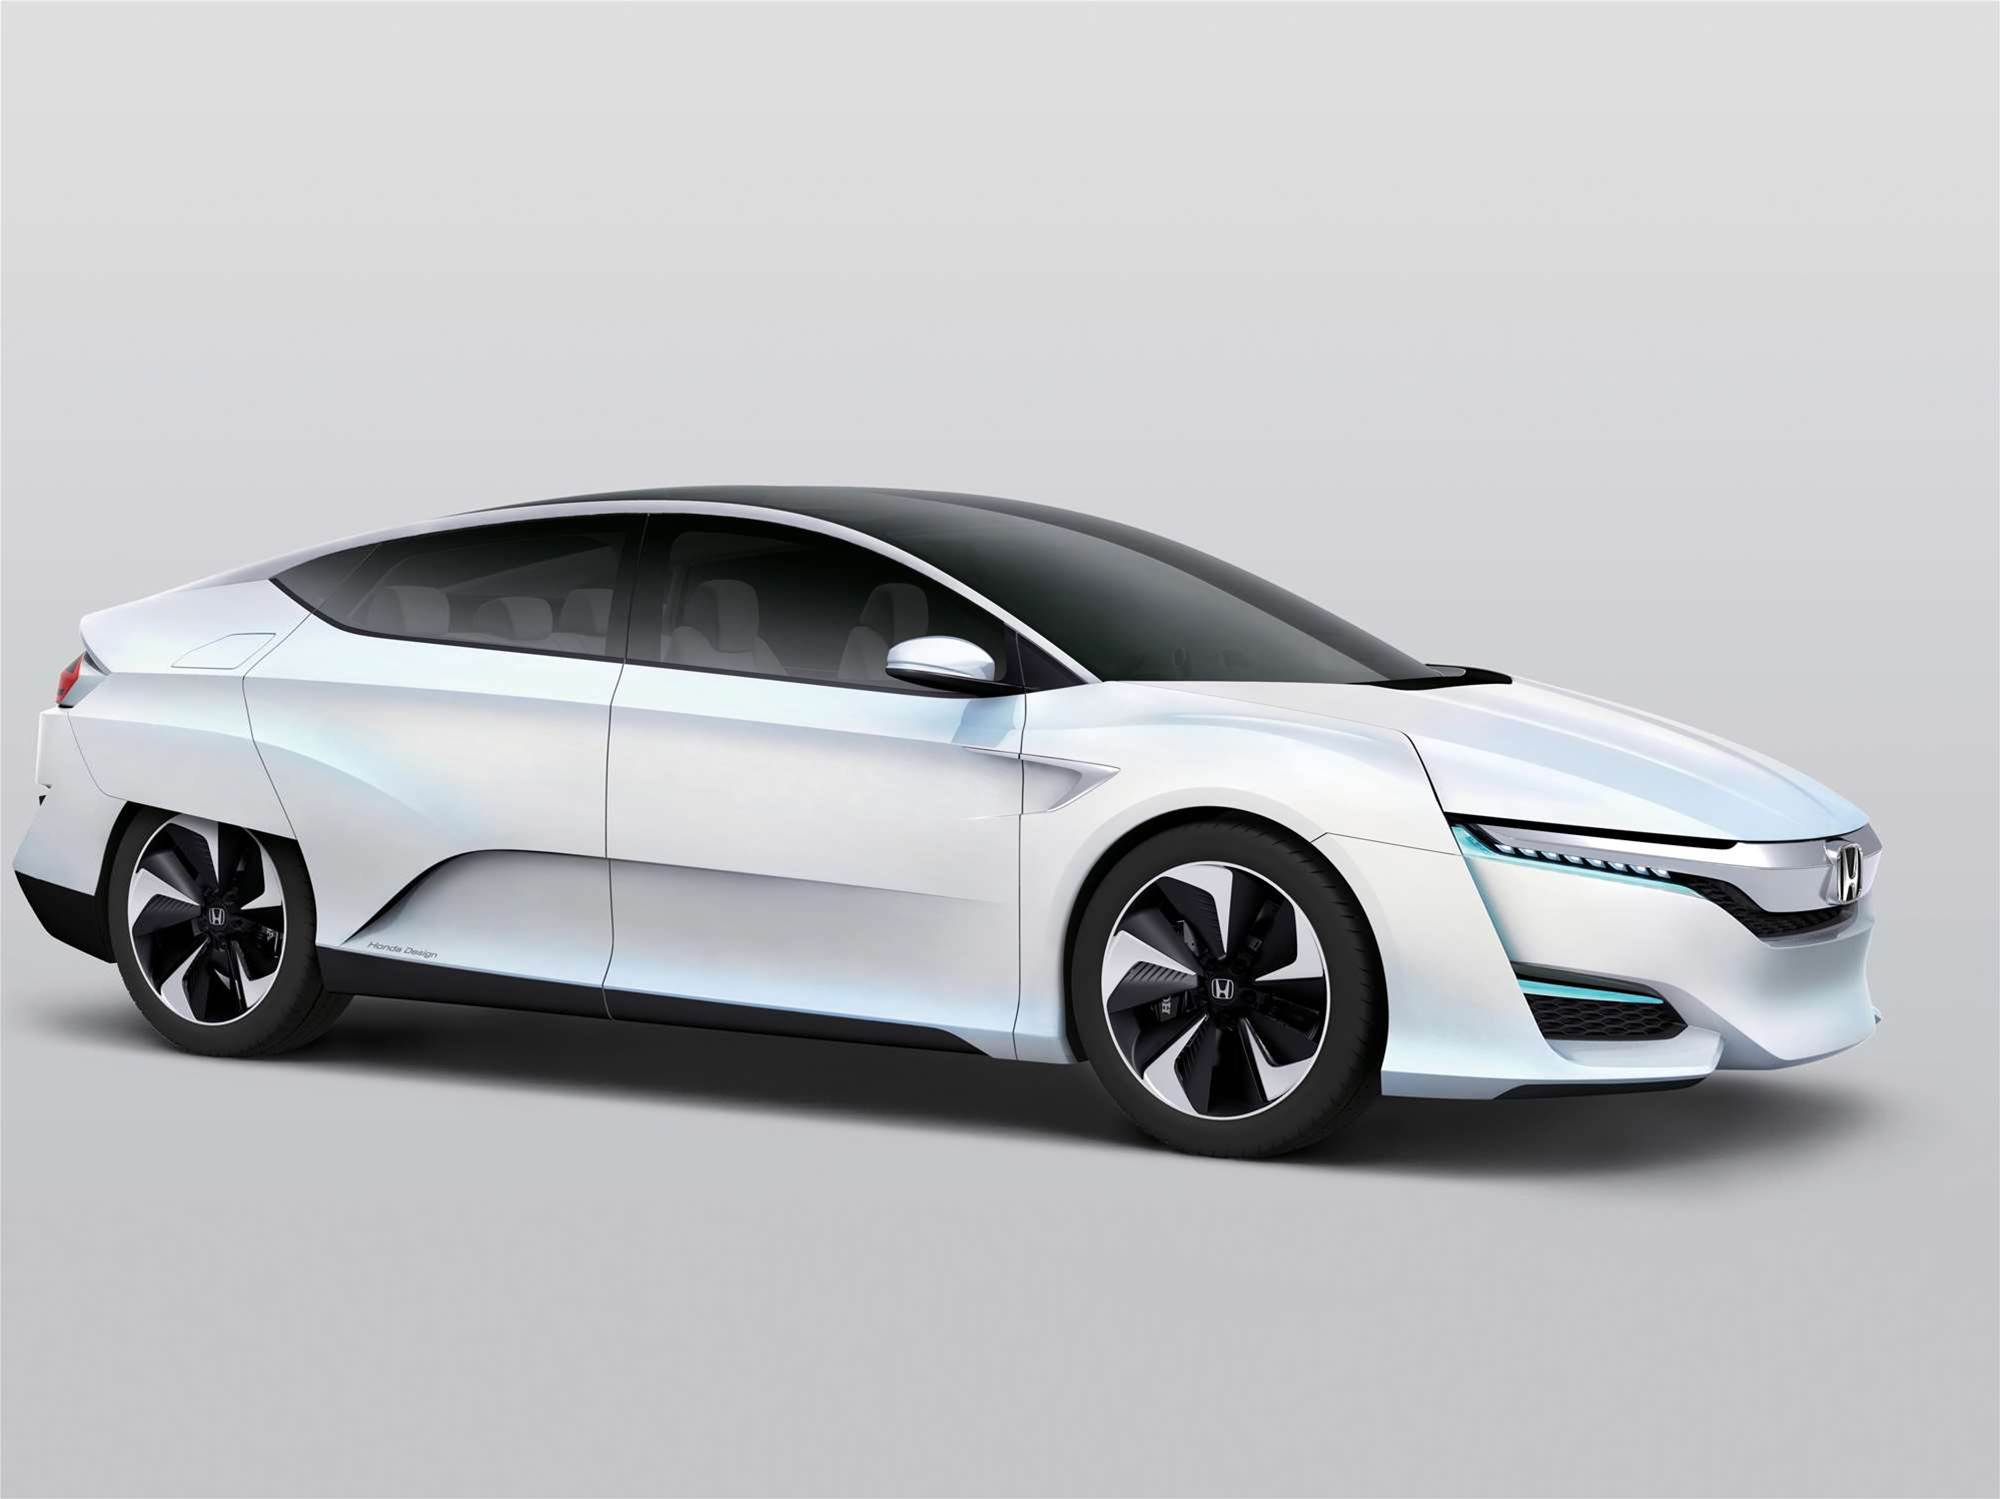 2015 Detroit Auto Show: Honda FCV Concept Offers More Power, More Space